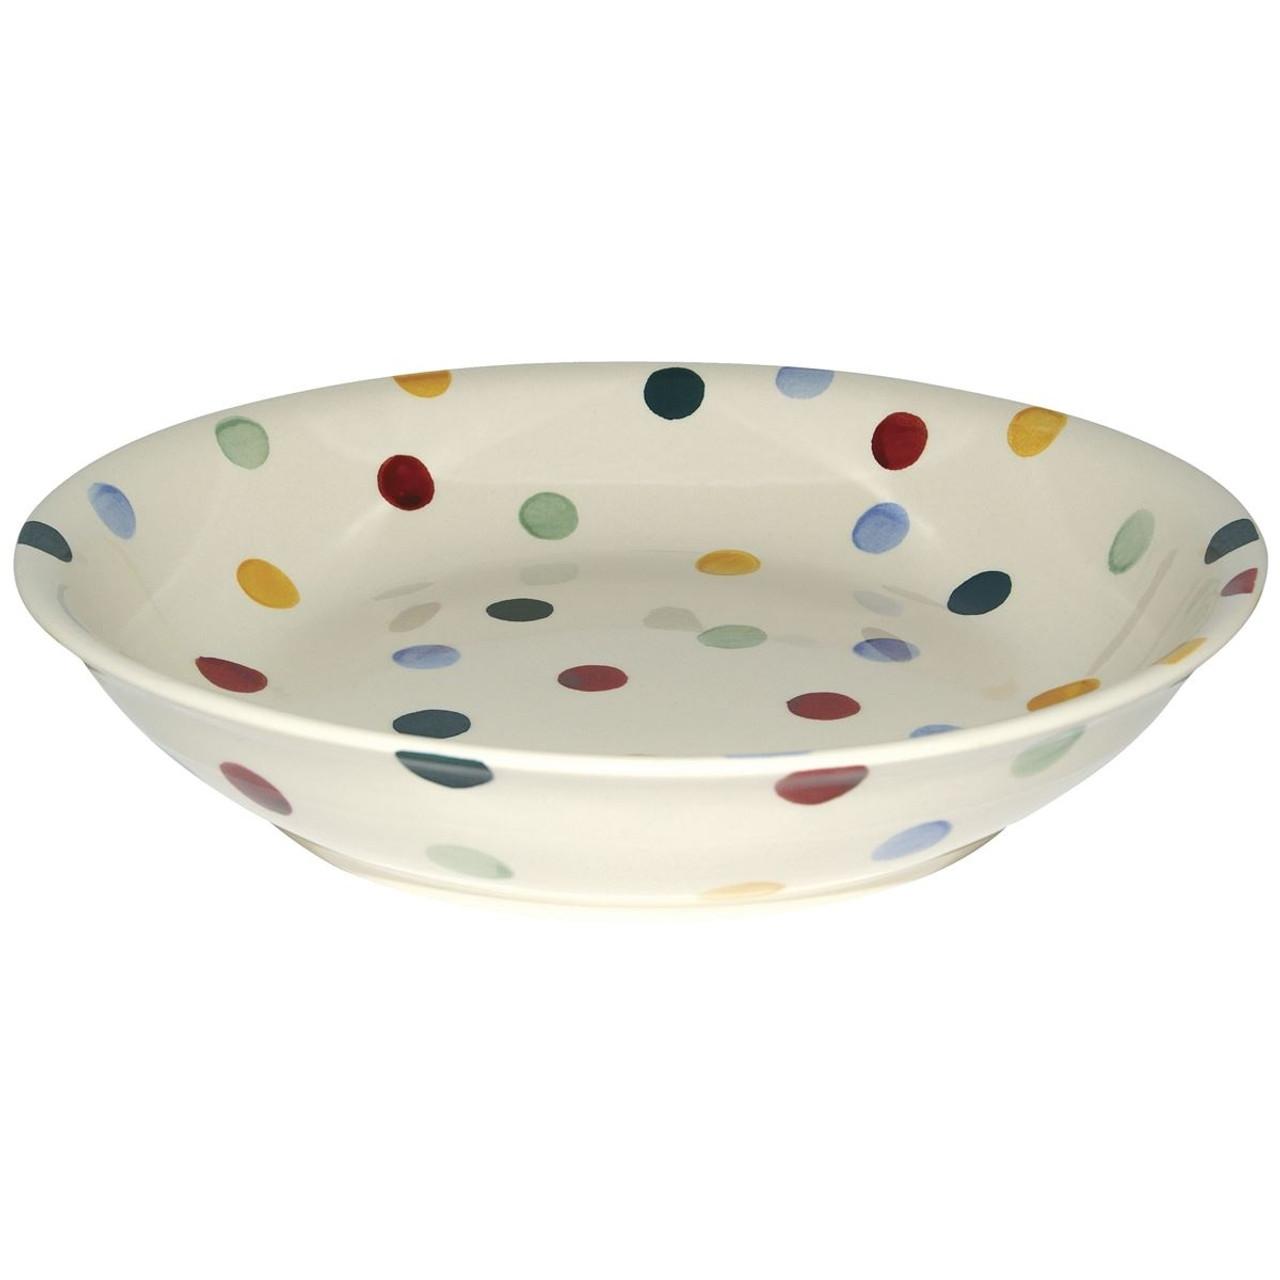 Emma Bridgewater Polka Dot Pasta Bowl